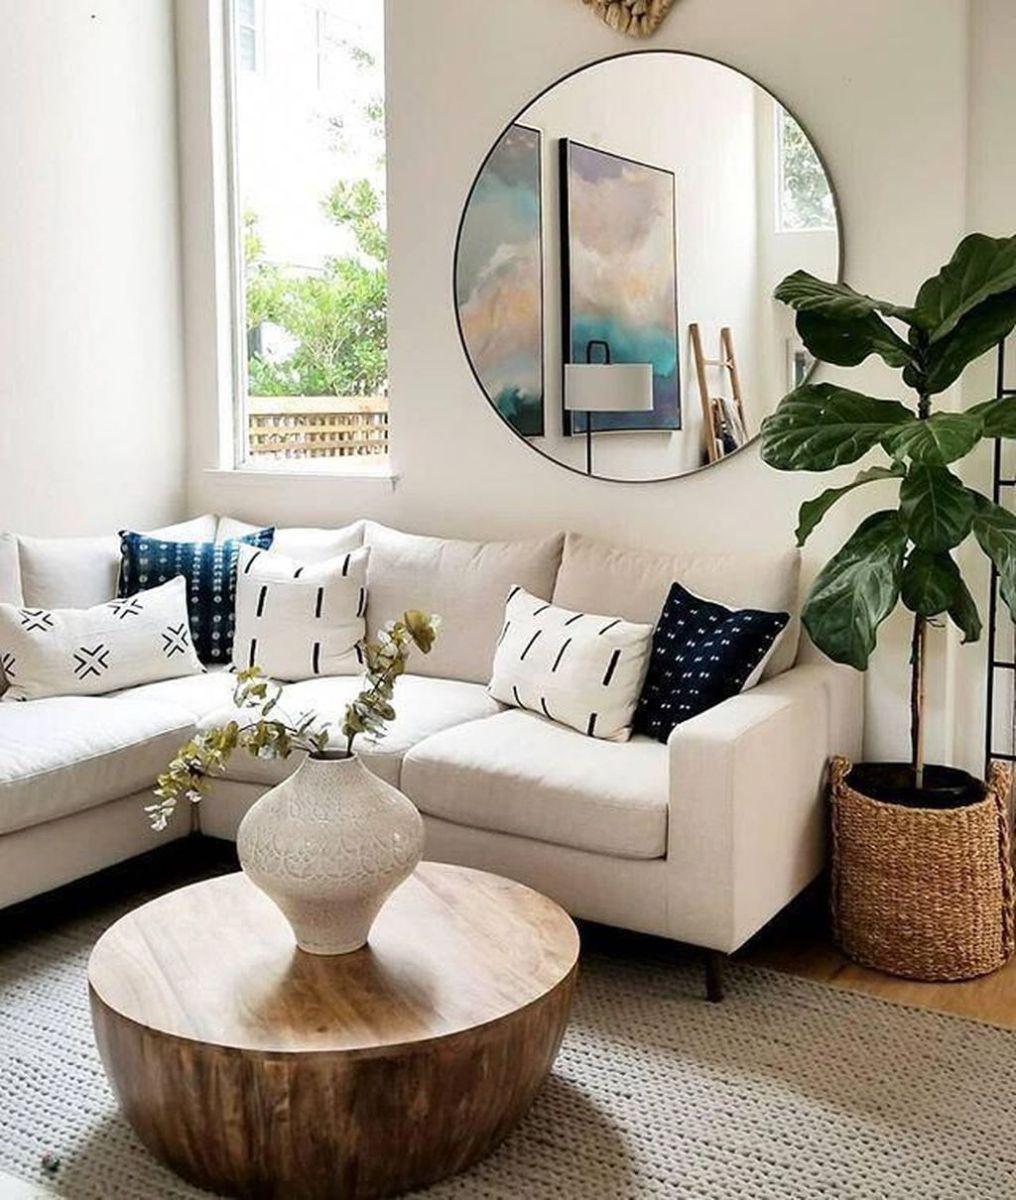 Admirable Modern Living Room Design Ideas You Should Copy 11